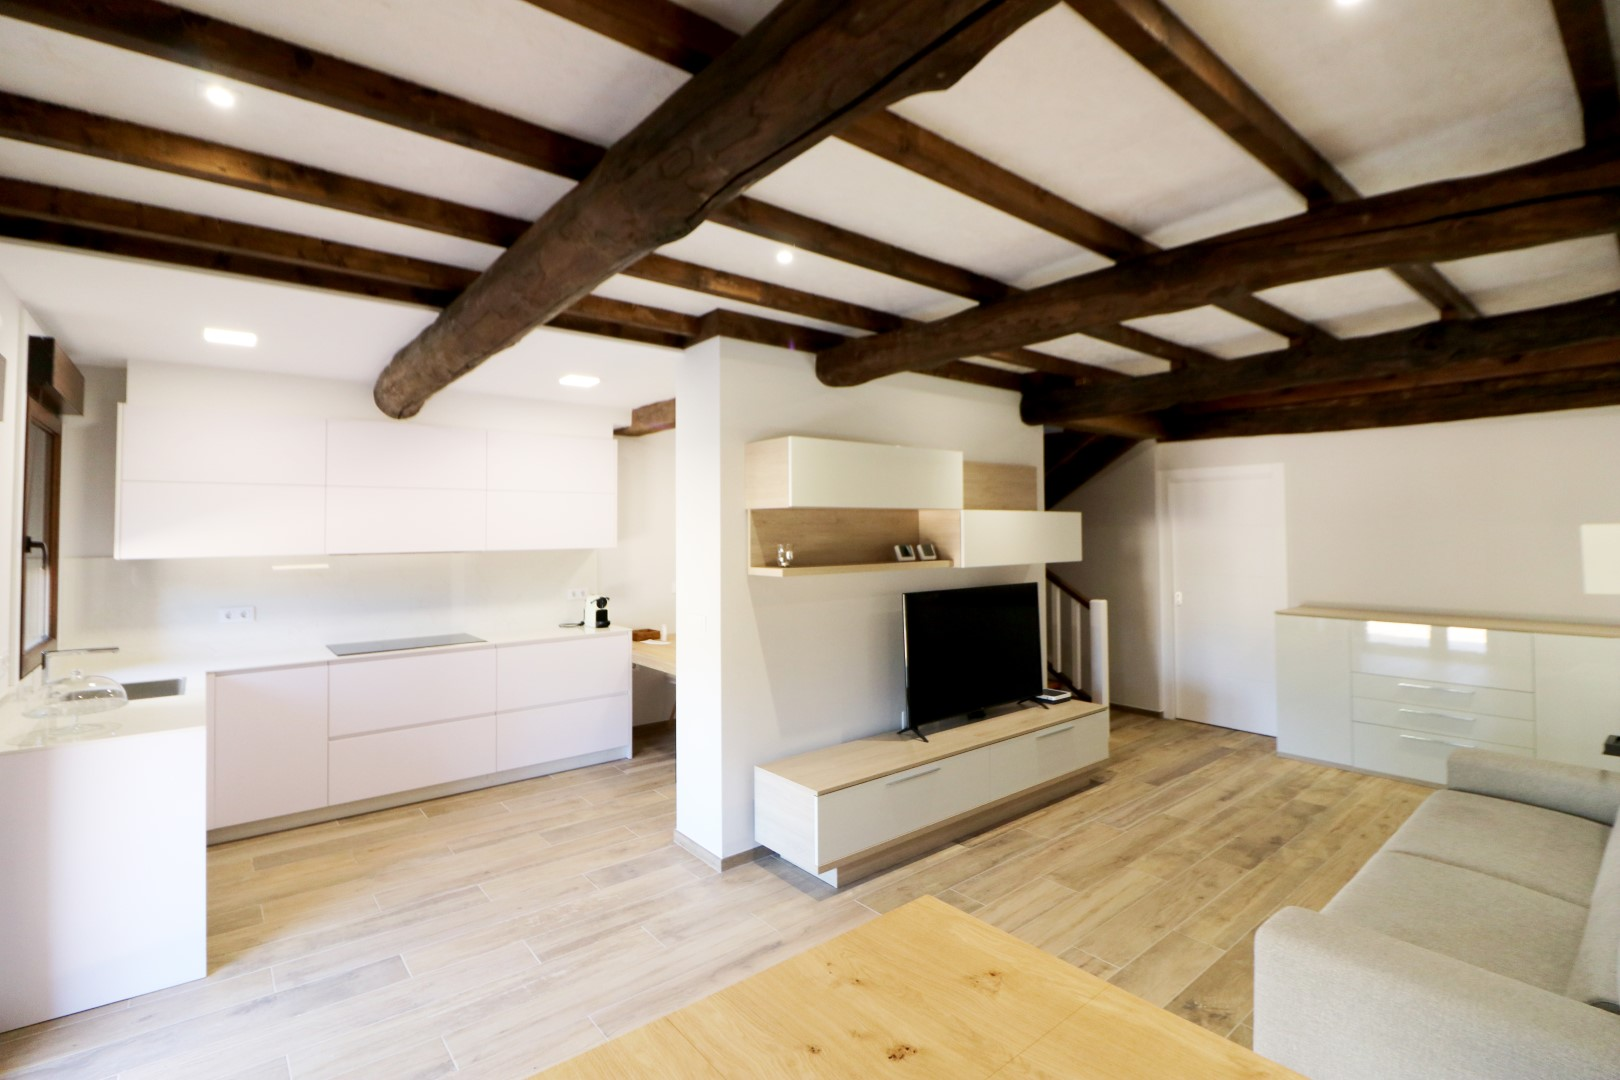 Rehabilitación completa vivienda Vigo. Arquitecto.